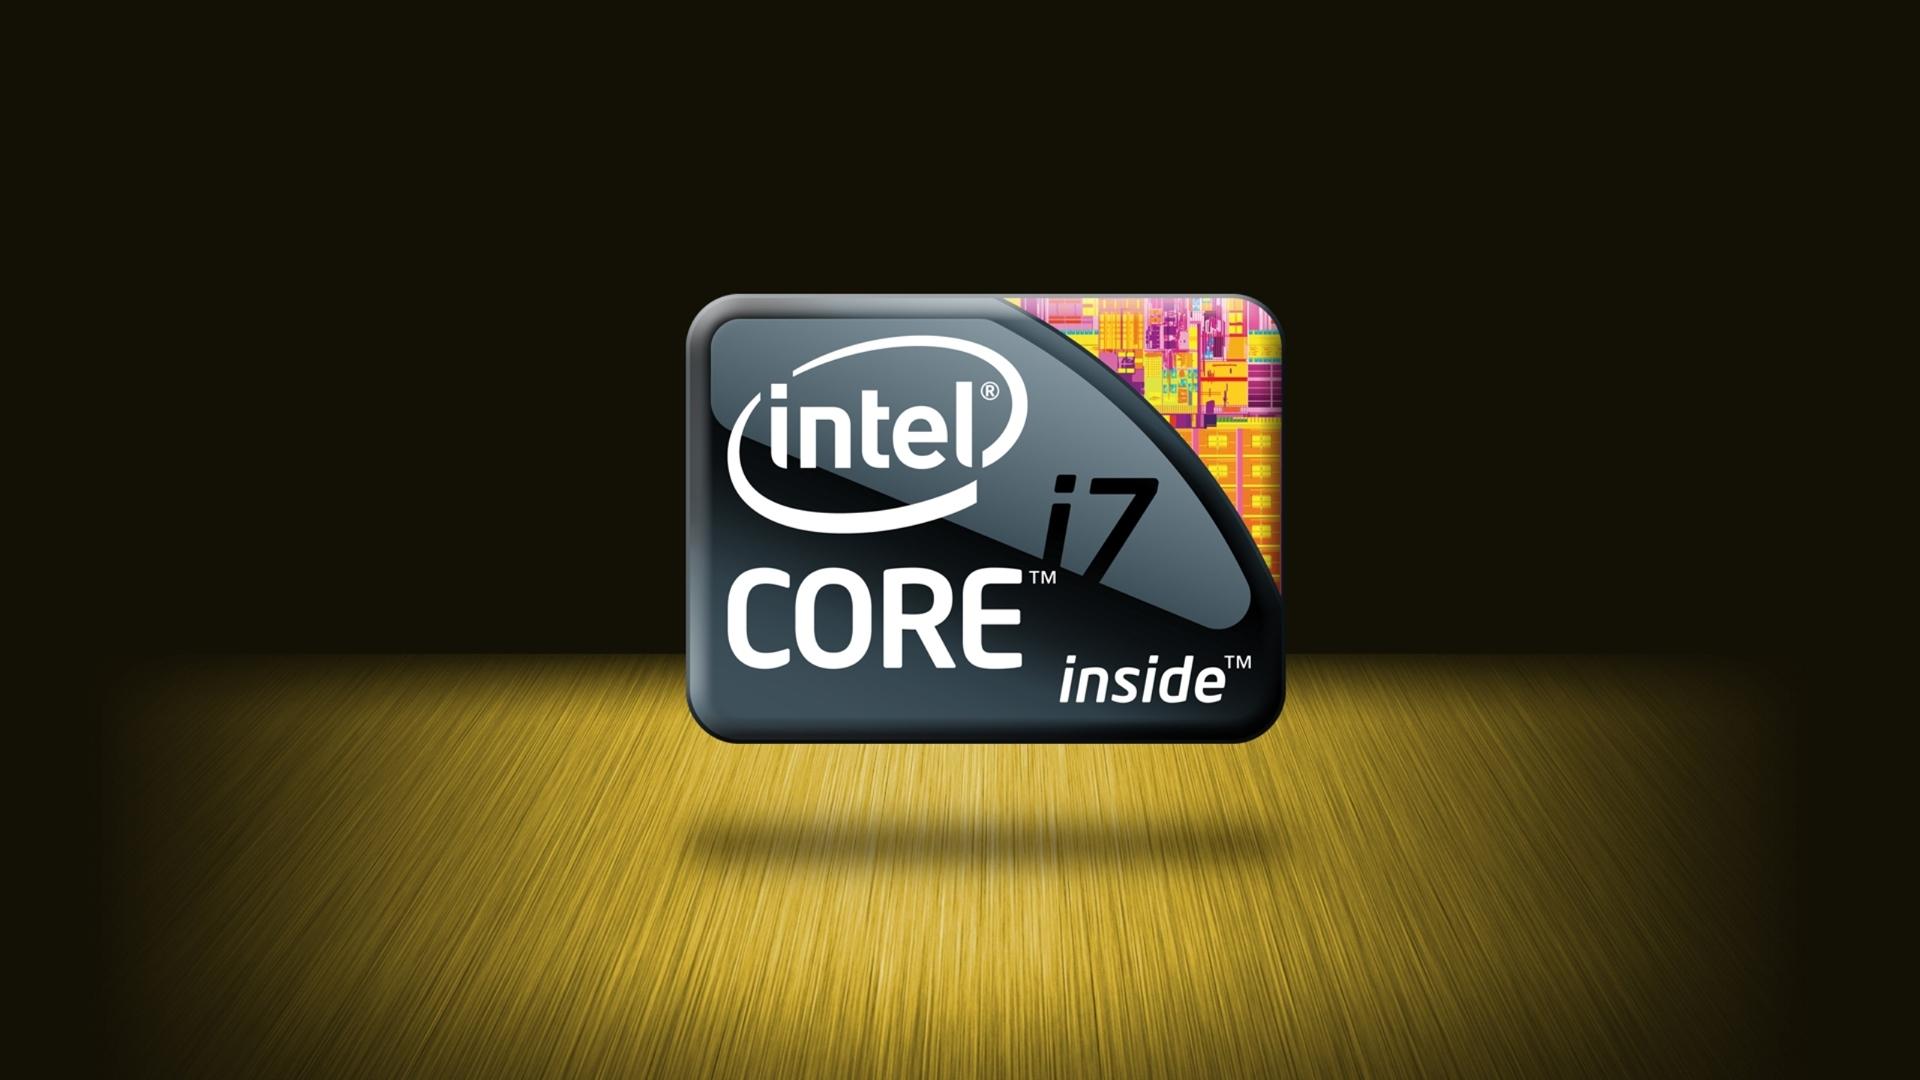 http://3.bp.blogspot.com/-btuMrZ0mWPg/UGKbMW0BJ1I/AAAAAAAAKmc/6s2dktsdAnw/s0/intel-core-i7-1920x1080-wallpaper.jpg